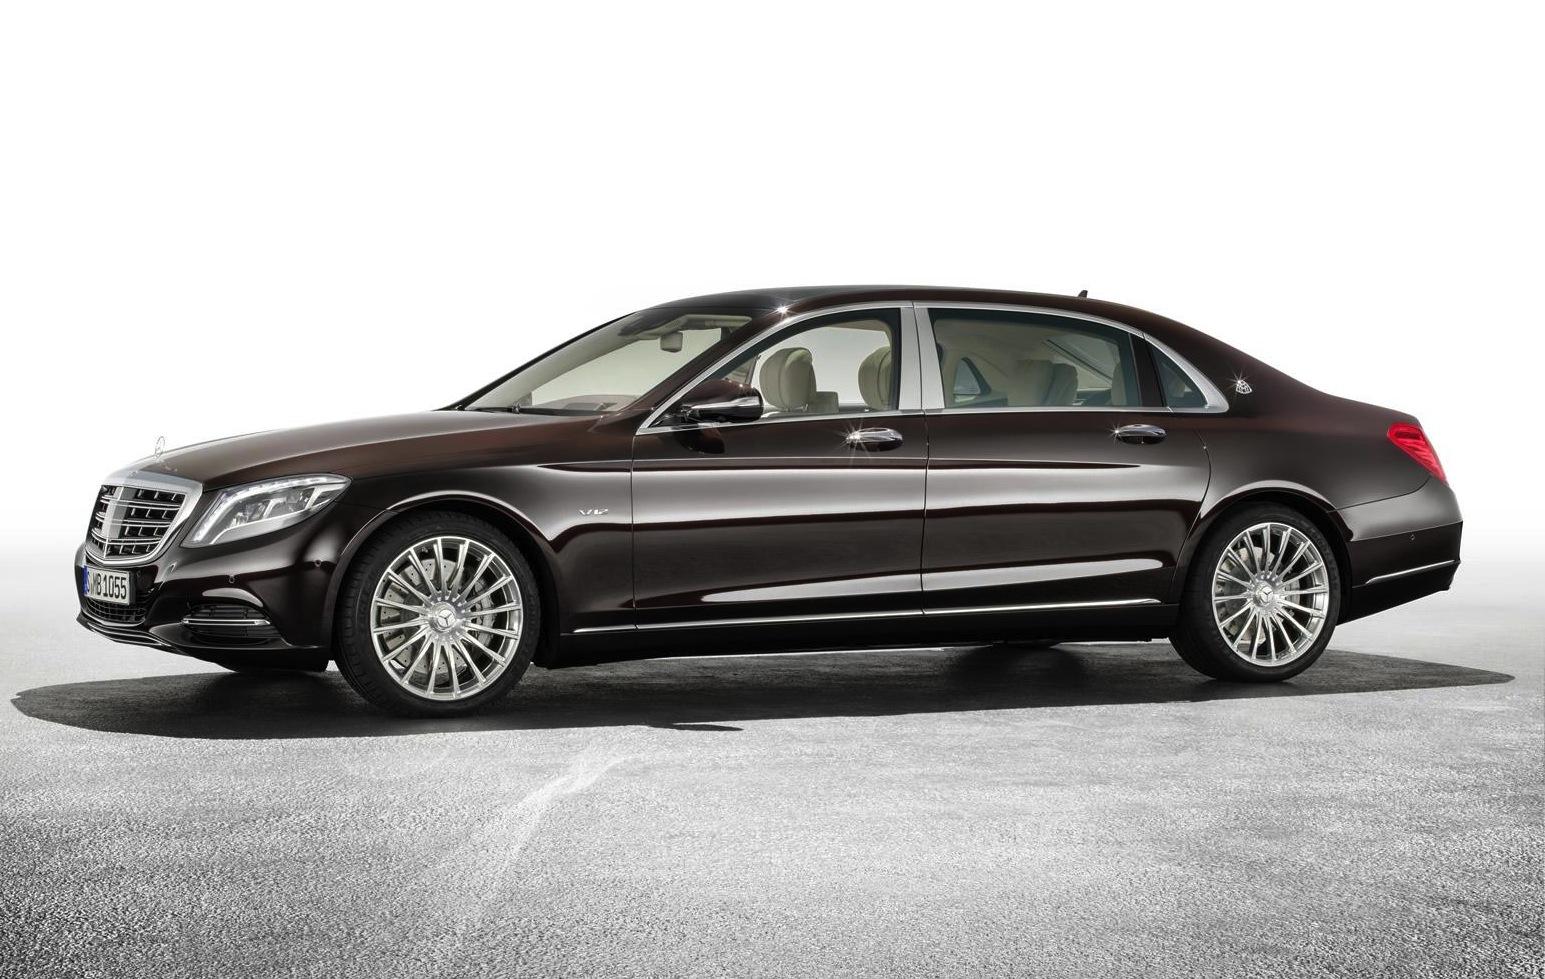 Mercedes-Maybach S-Class debuts at LA Auto Show